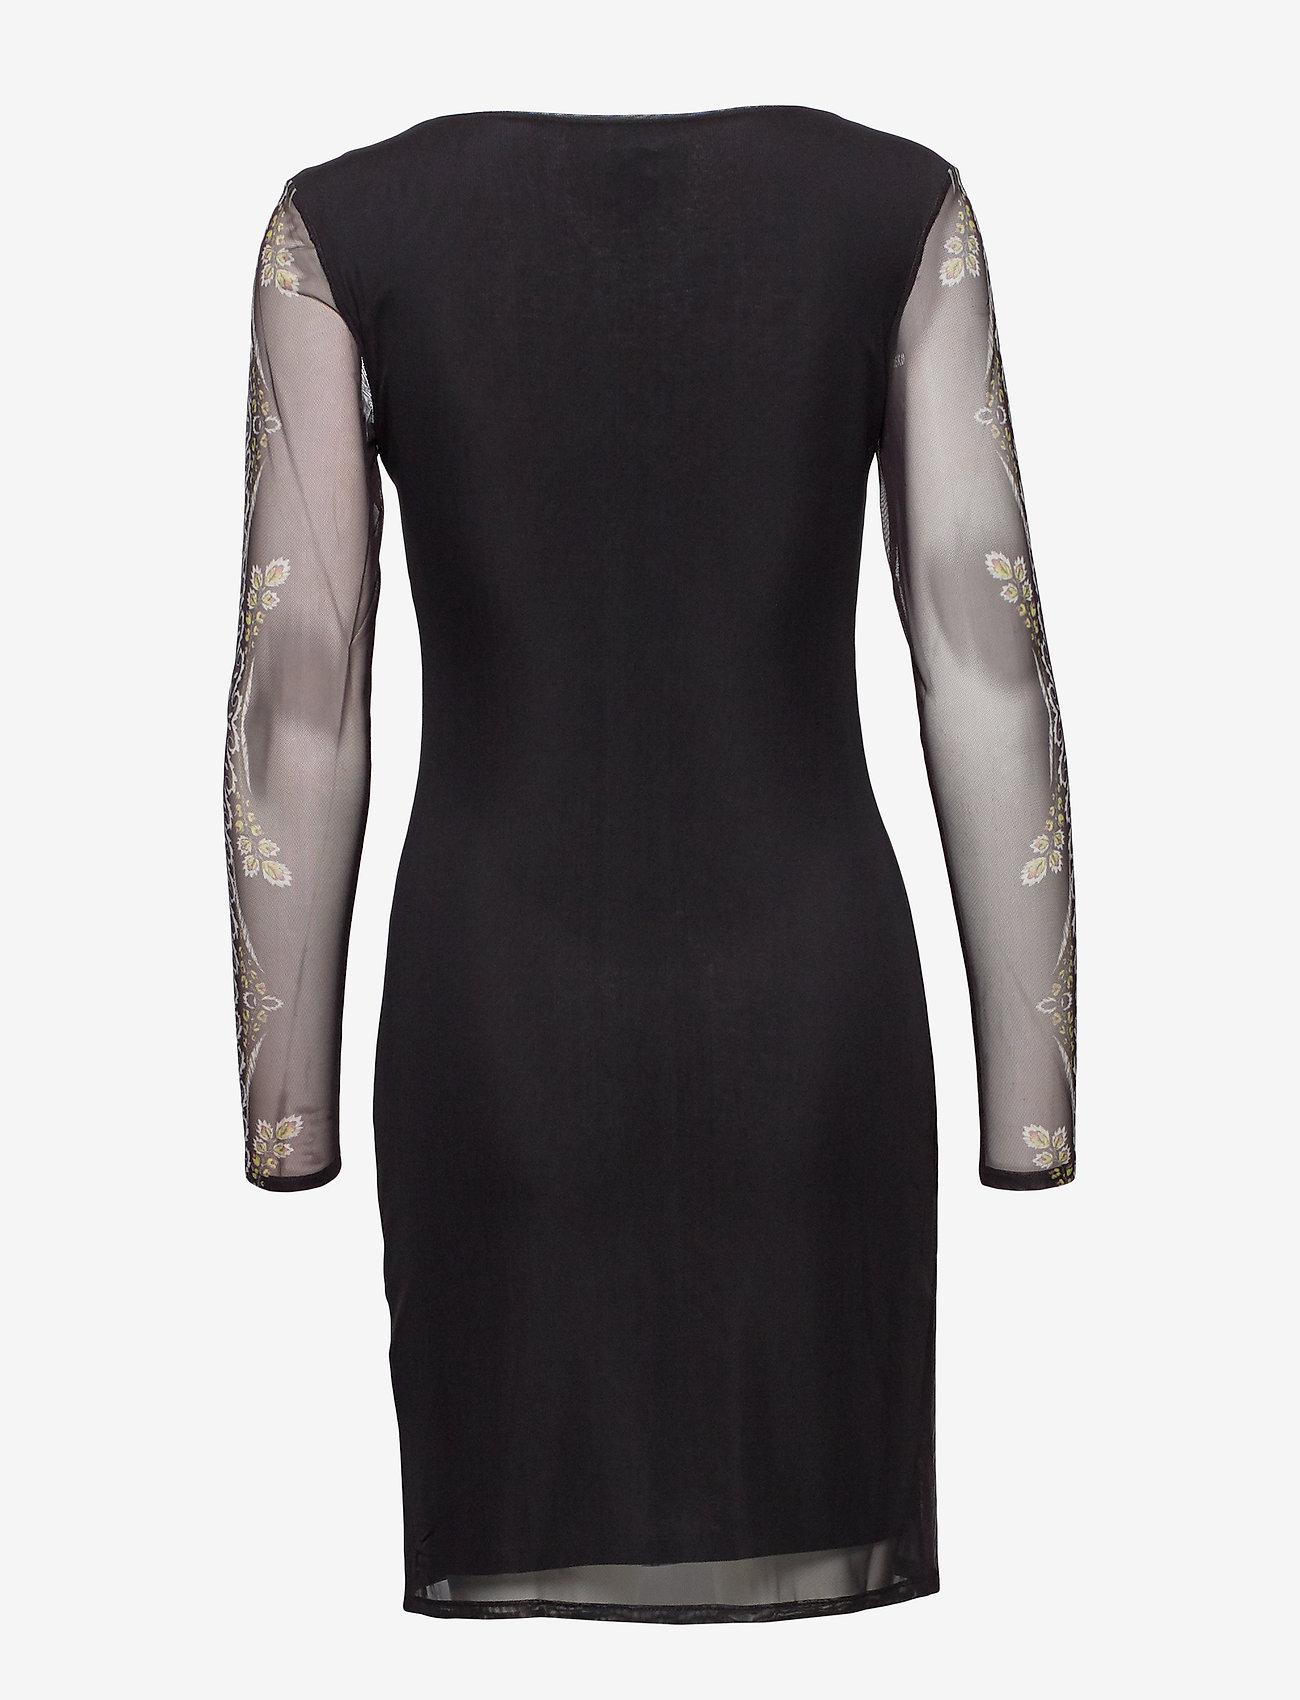 Desigual - VEST EYRE - midi jurken - negro - 1